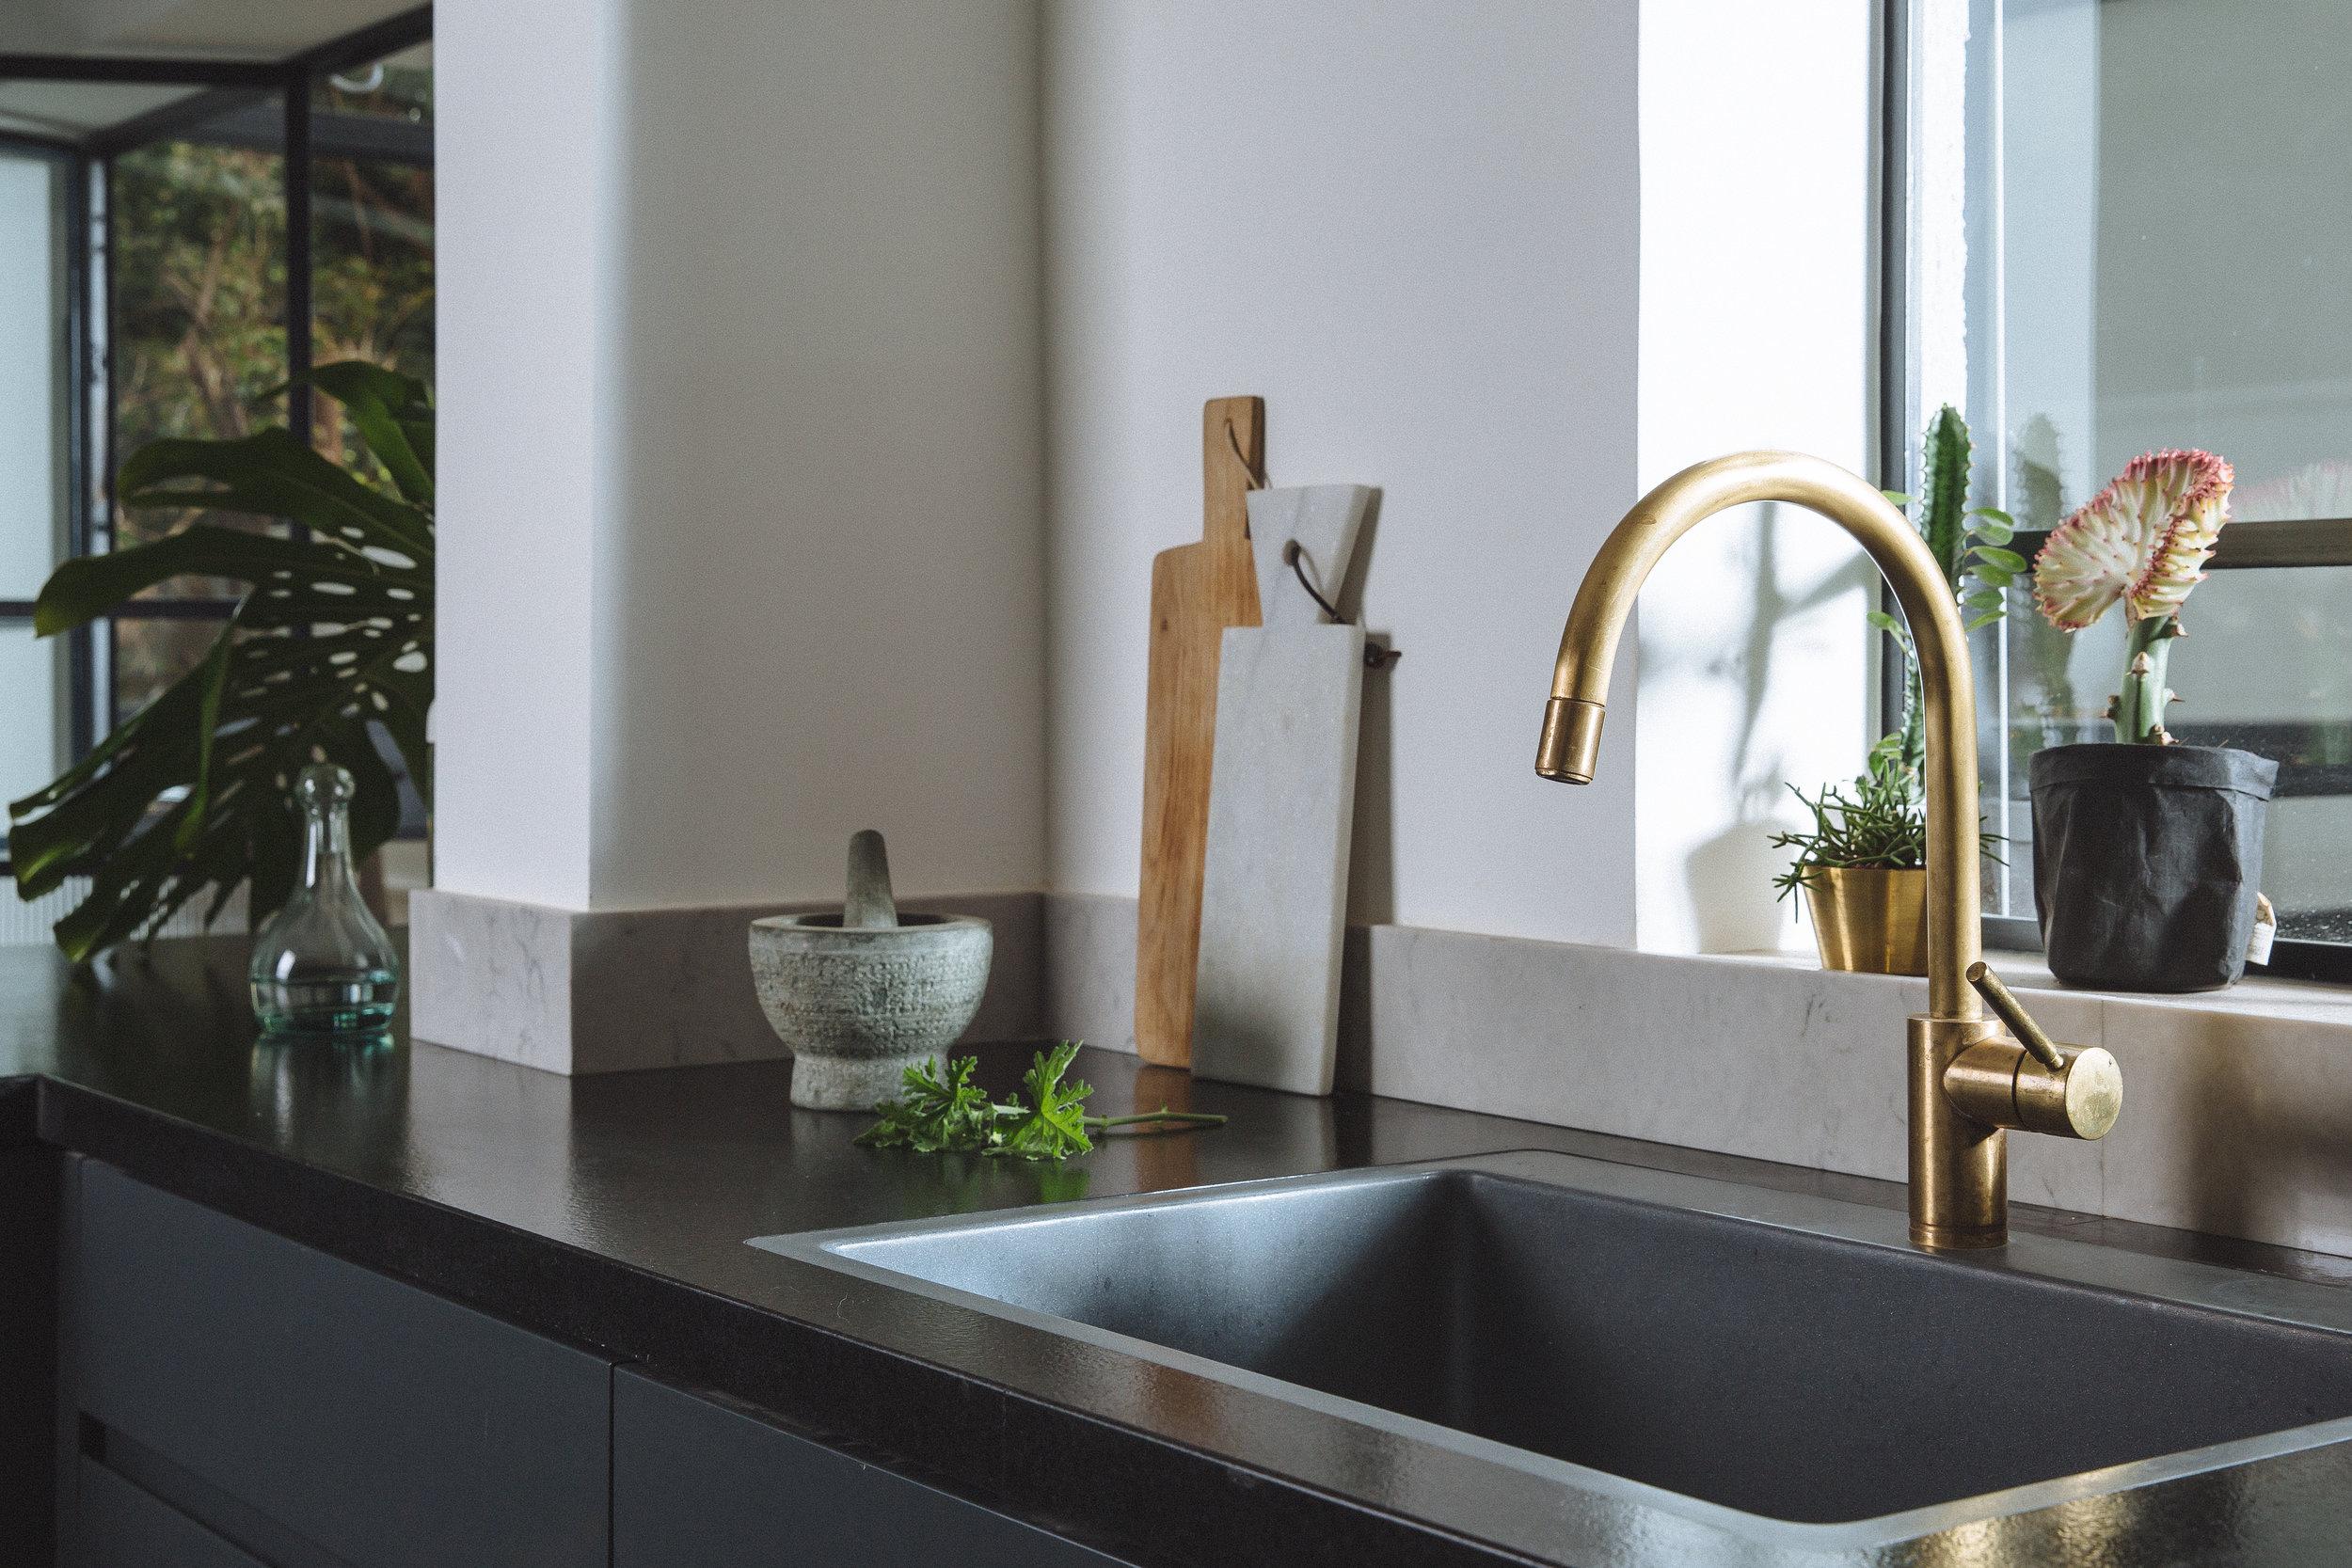 Dark themed kitchen, minimalist and elegant. Brass faucet